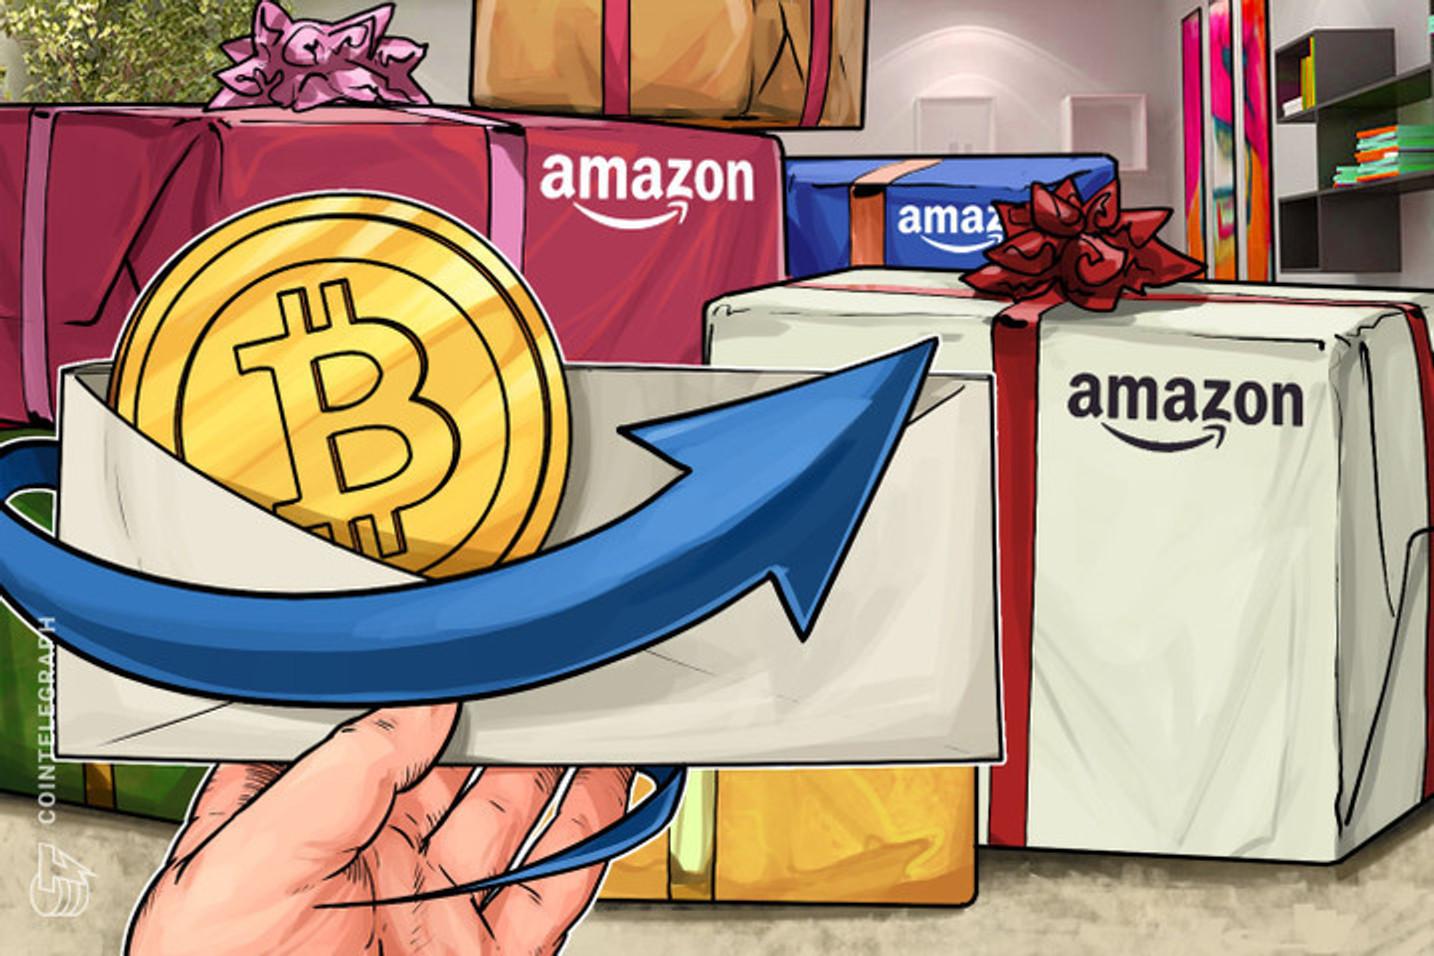 ¿Amazon acepta Bitcoin? Cómo comprar en Amazon con BTC